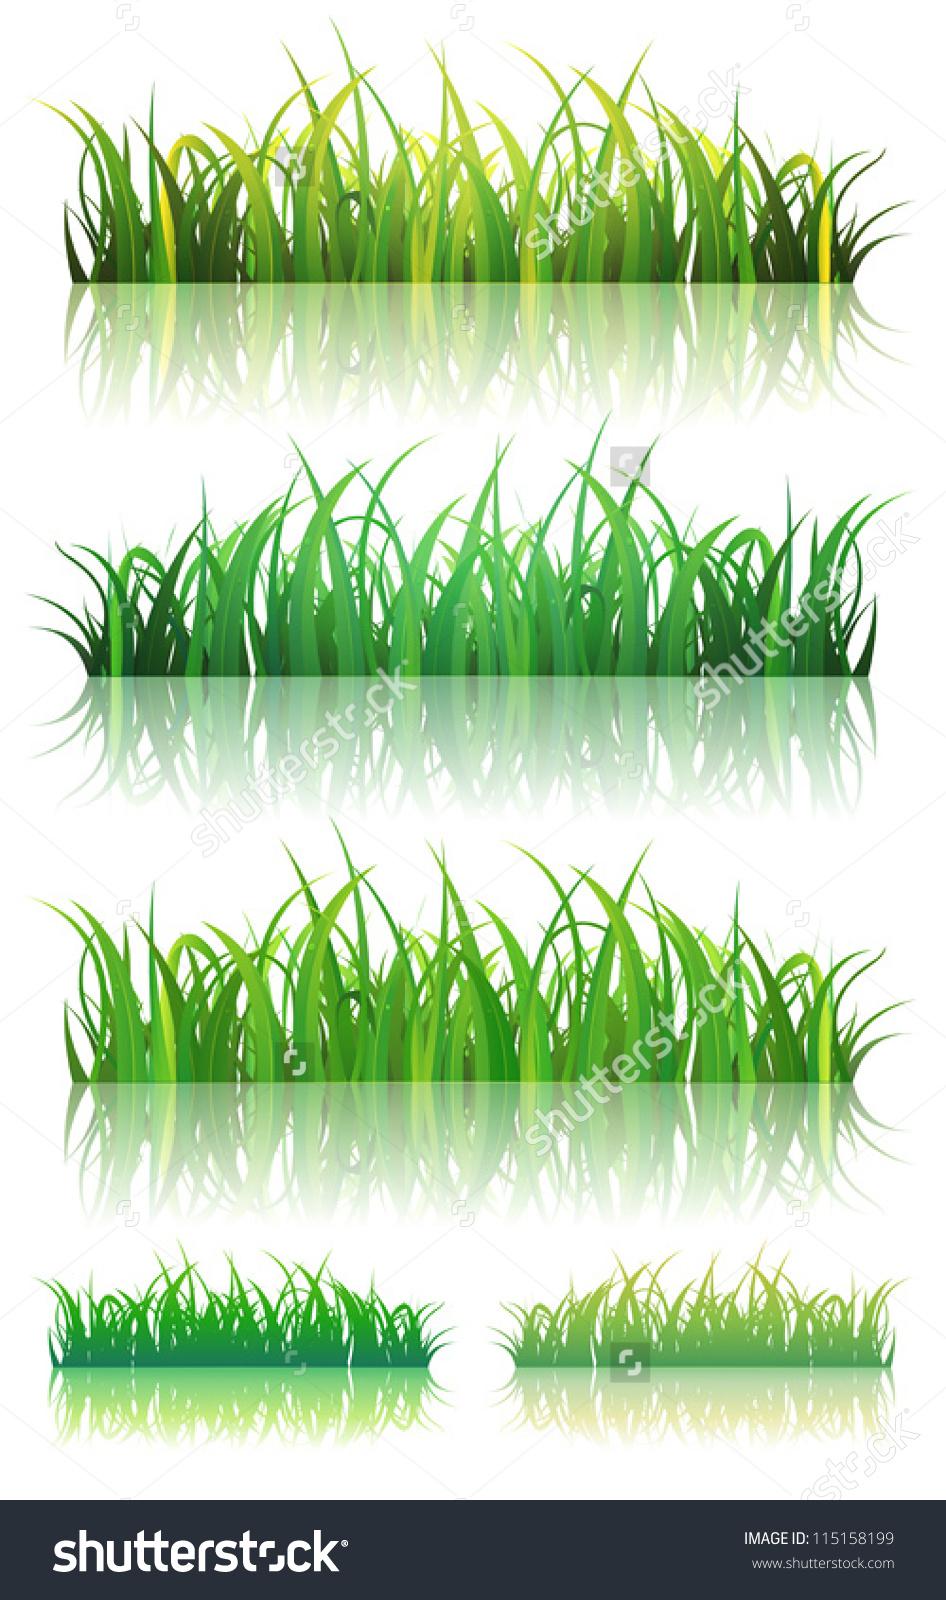 Thin grass clipart freeuse Spring Summer Green Grass Set Illustration Stock Vector 115158199 ... freeuse